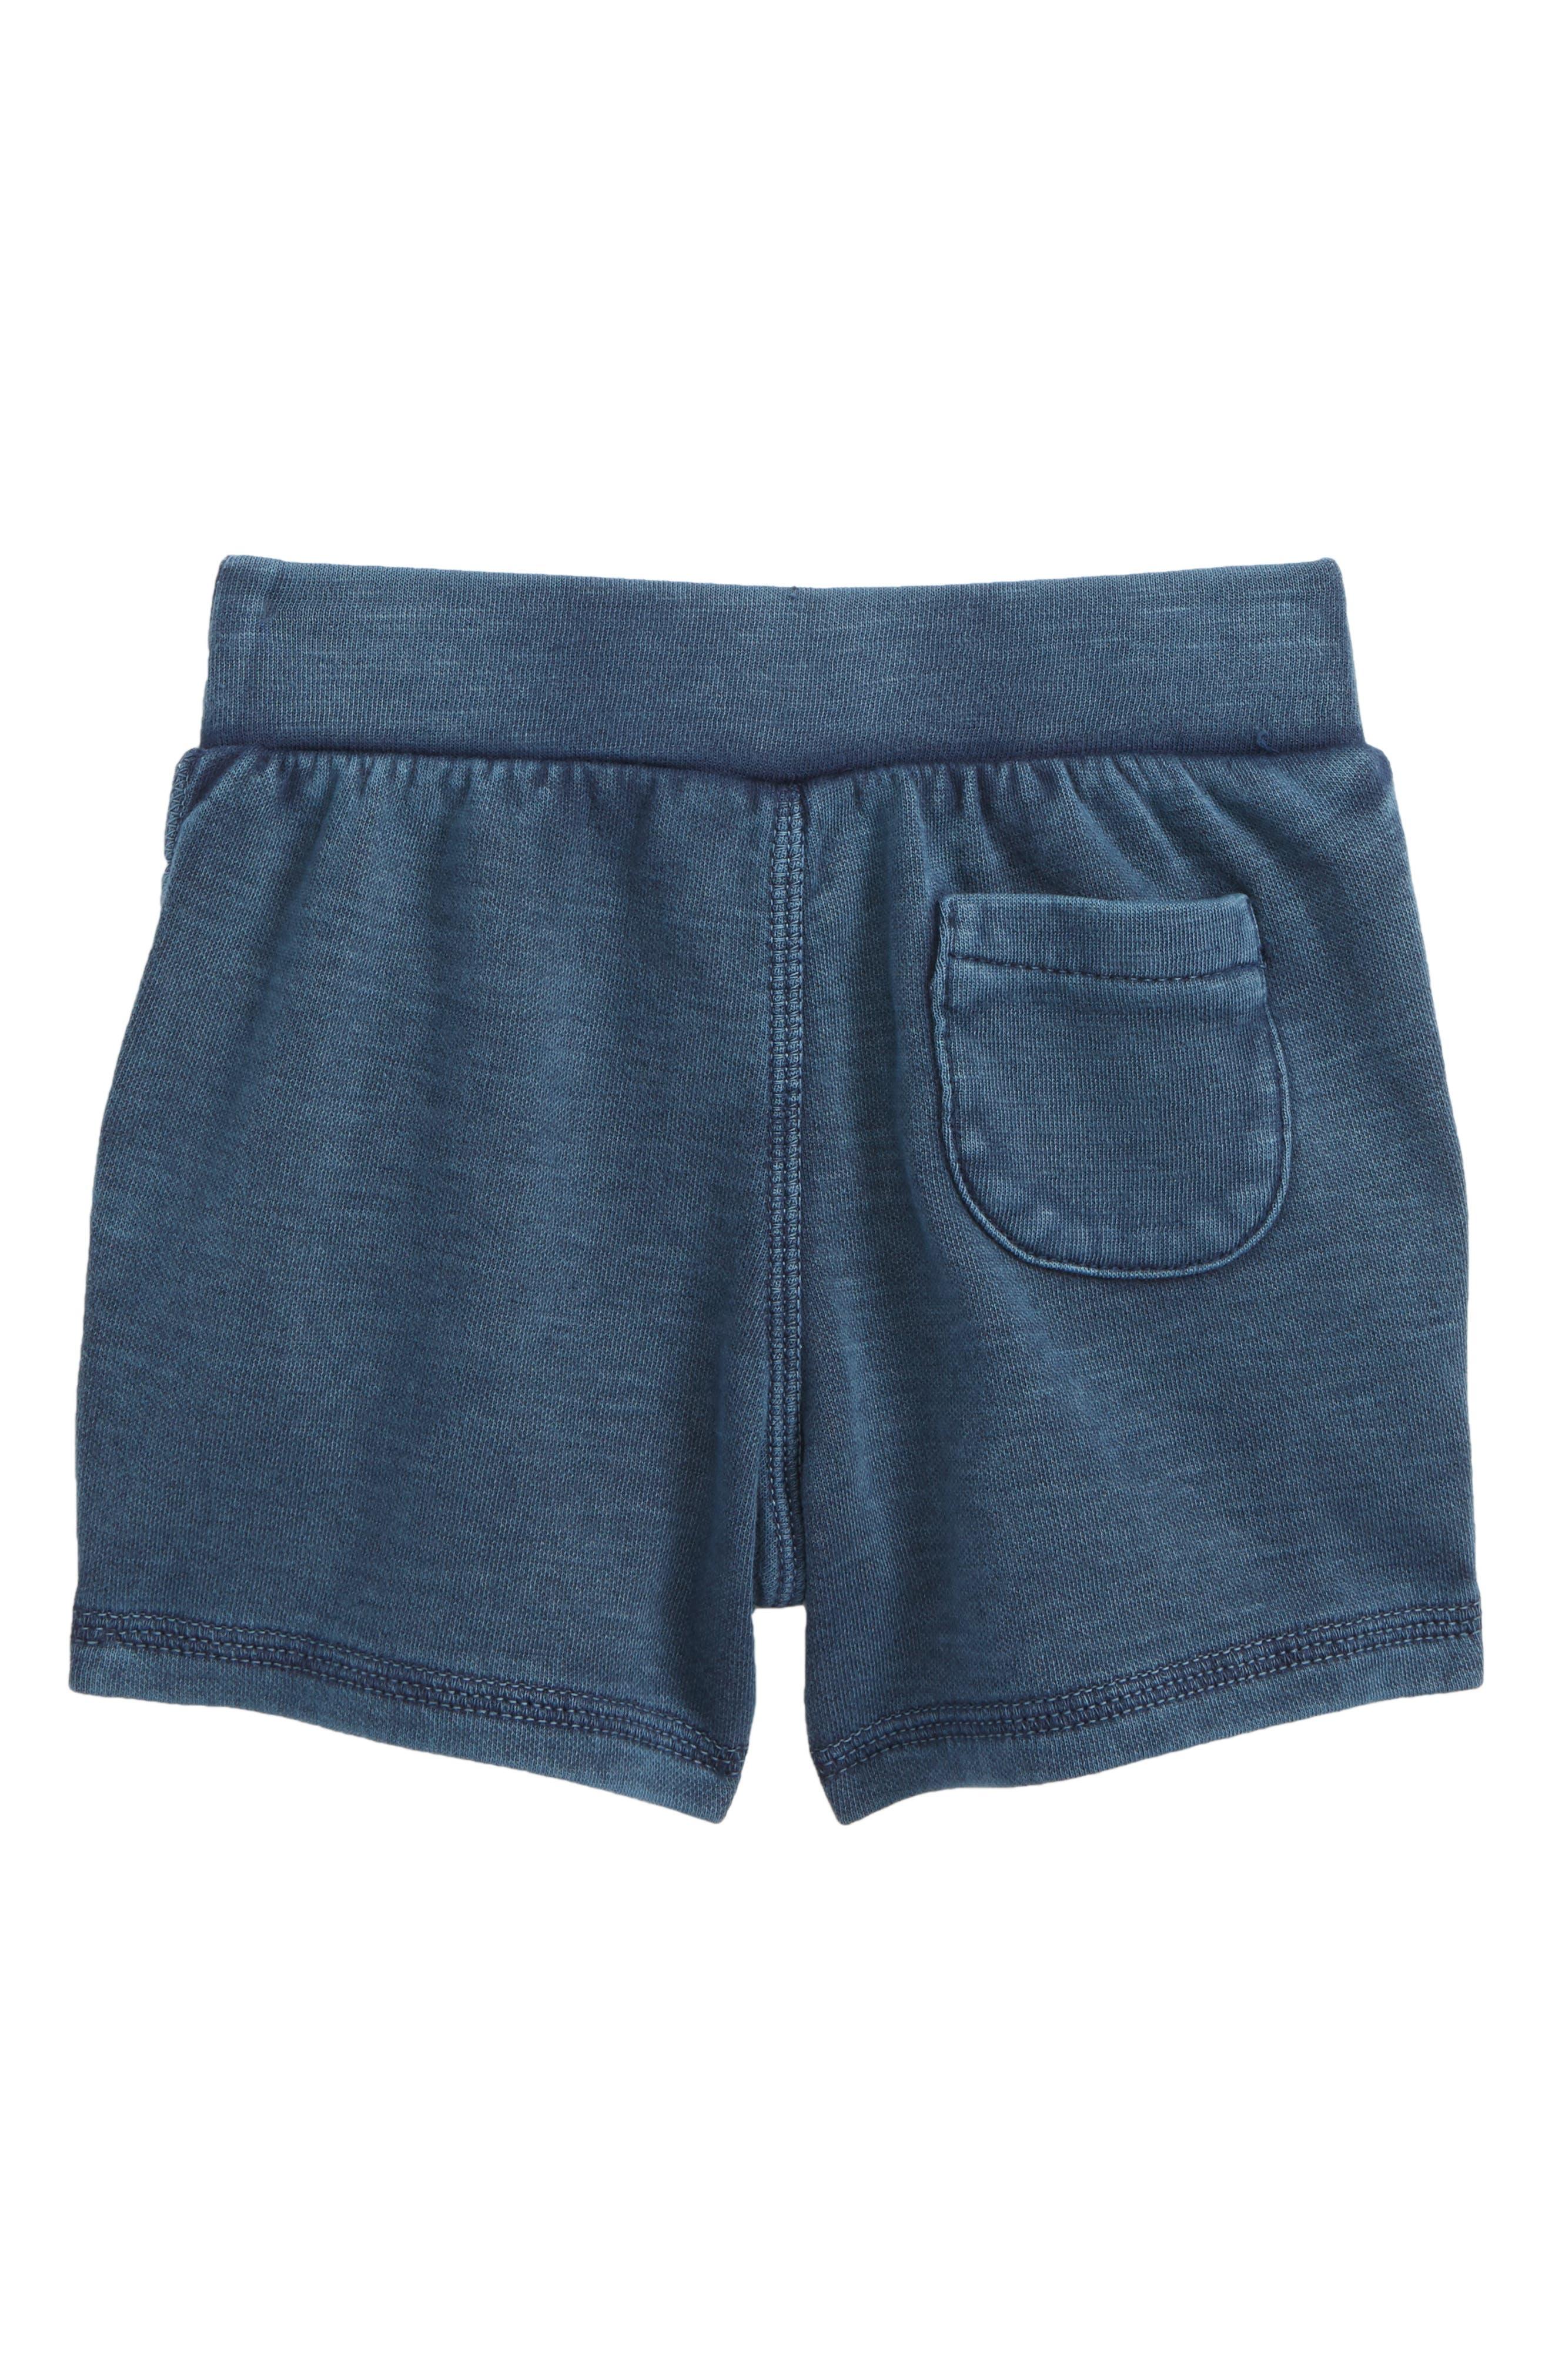 Alternate Image 2  - Tucker + Tate Knit Shorts (Baby Boys)